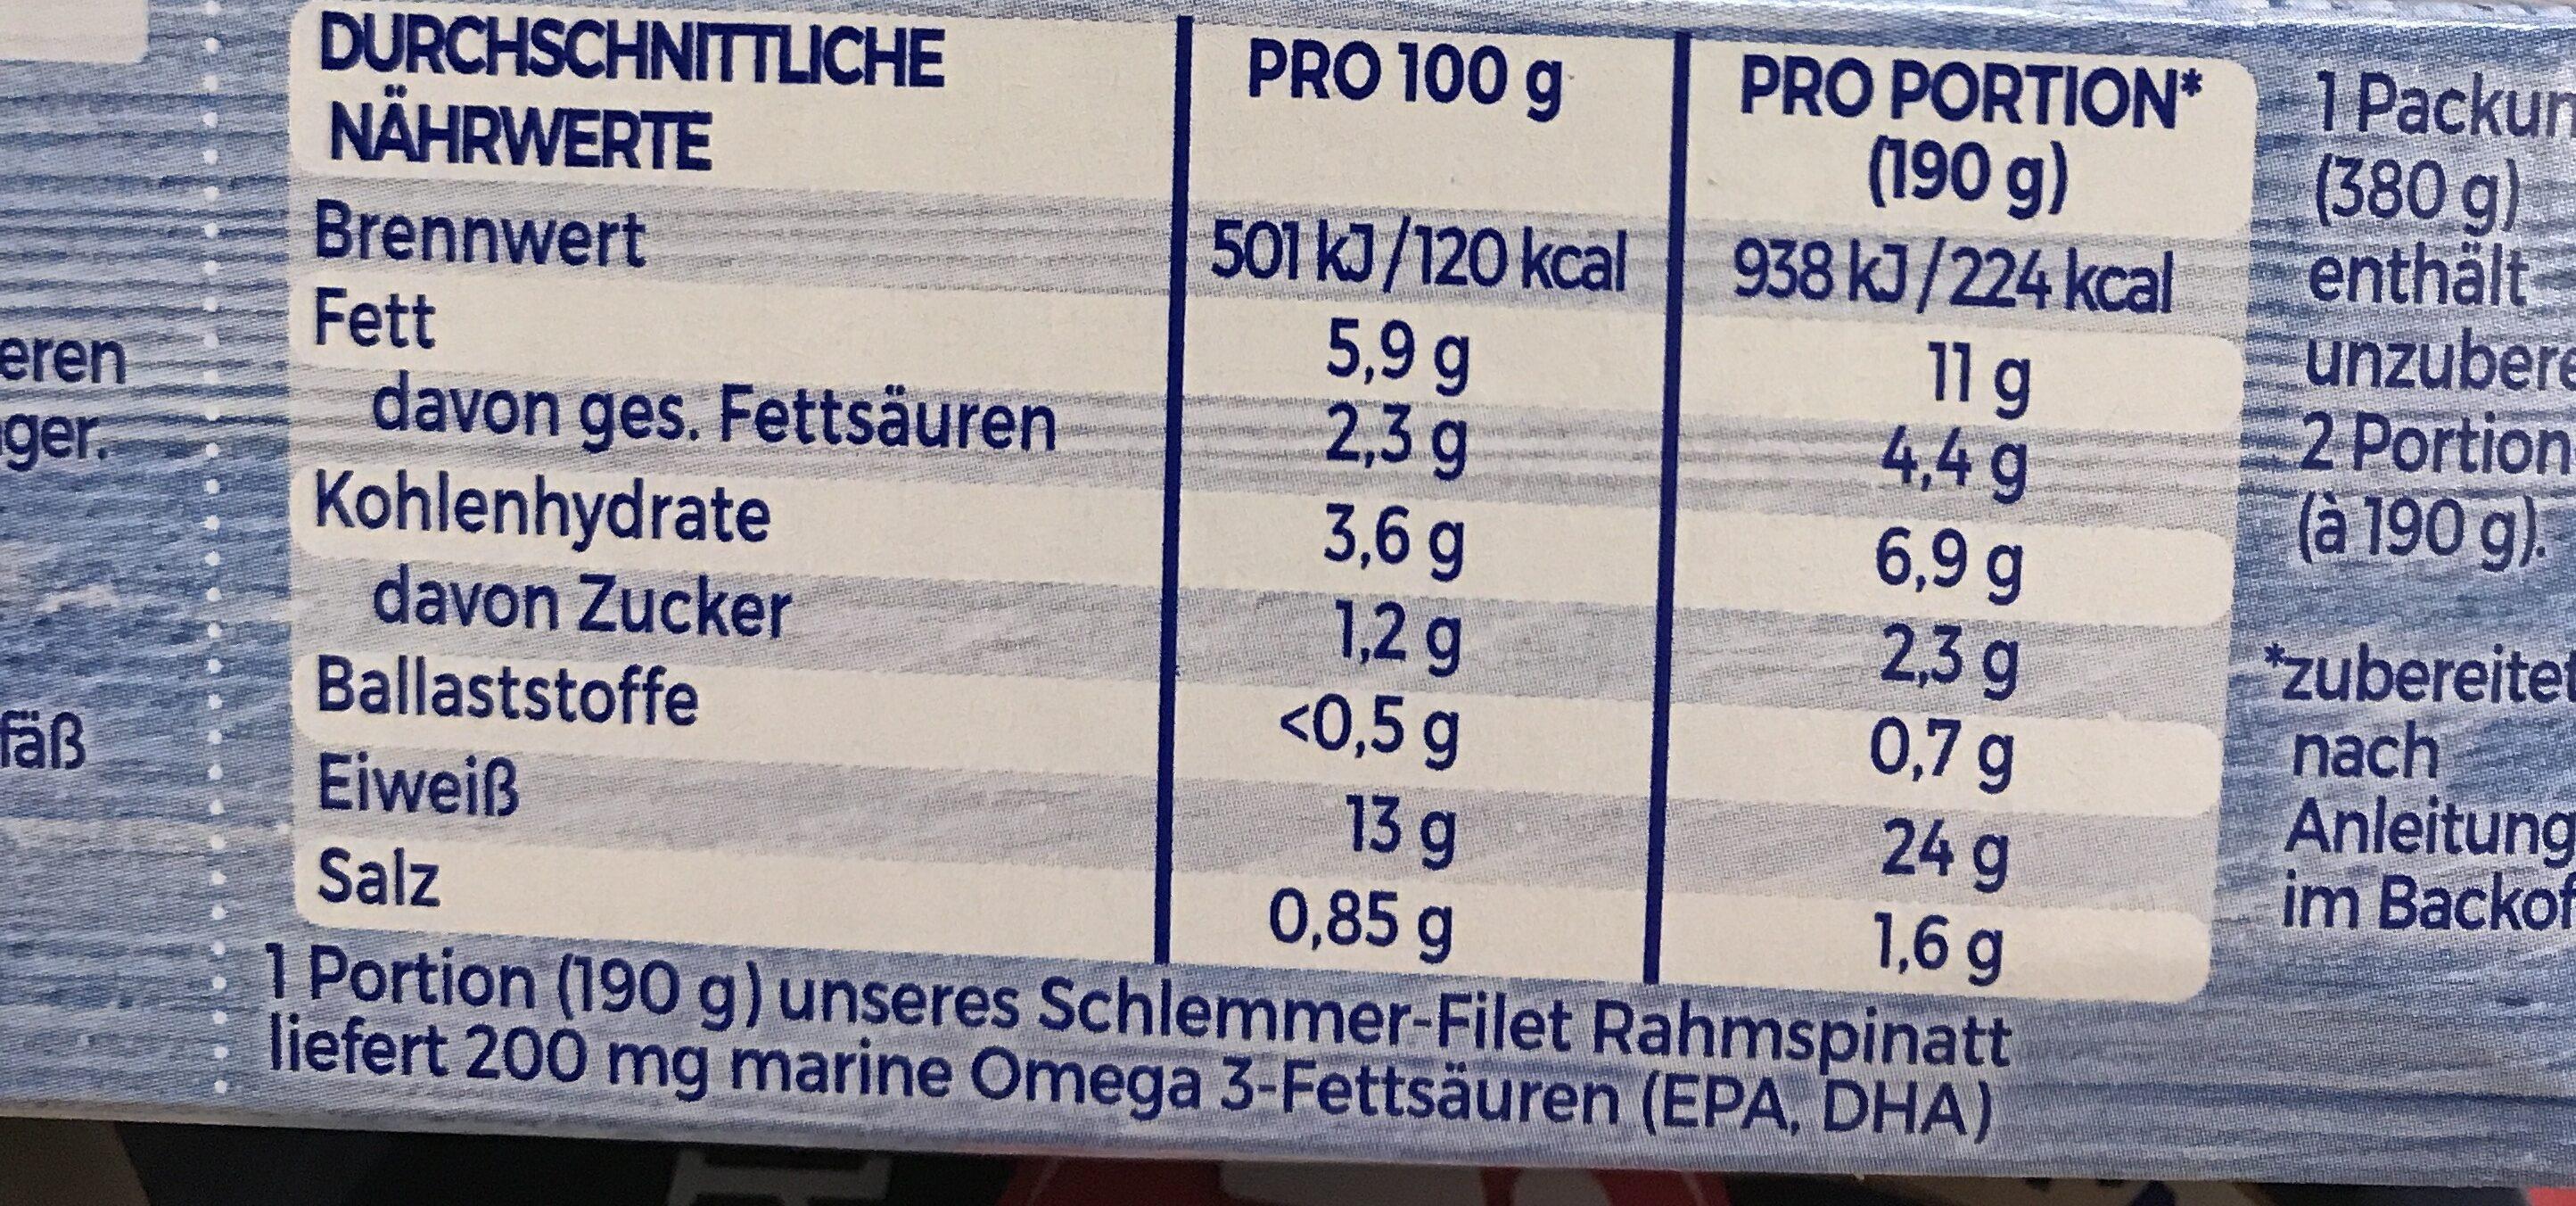 Schlemmer Filet, Rahm Spinat Mit Dem Blubb - Voedingswaarden - fr